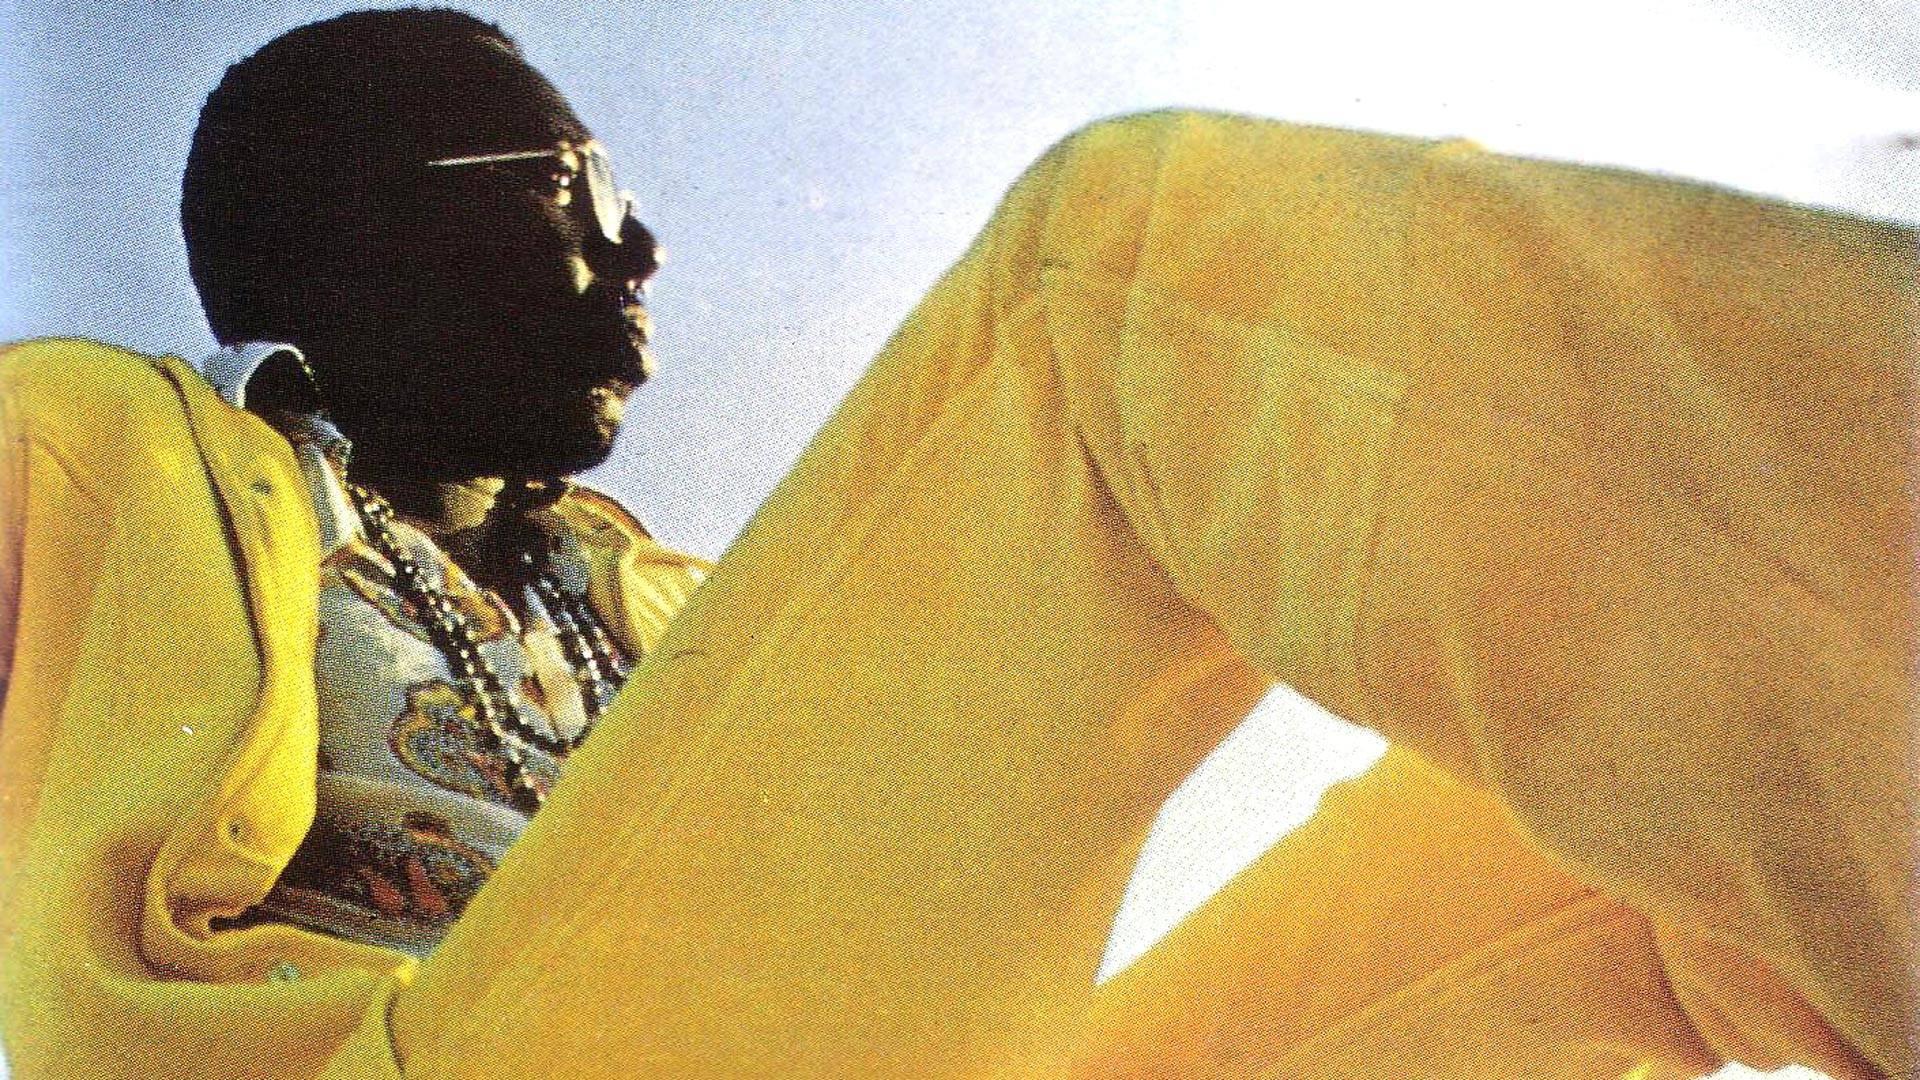 Curtis Mayfield's 1970 album, 'Curtis' (detail).